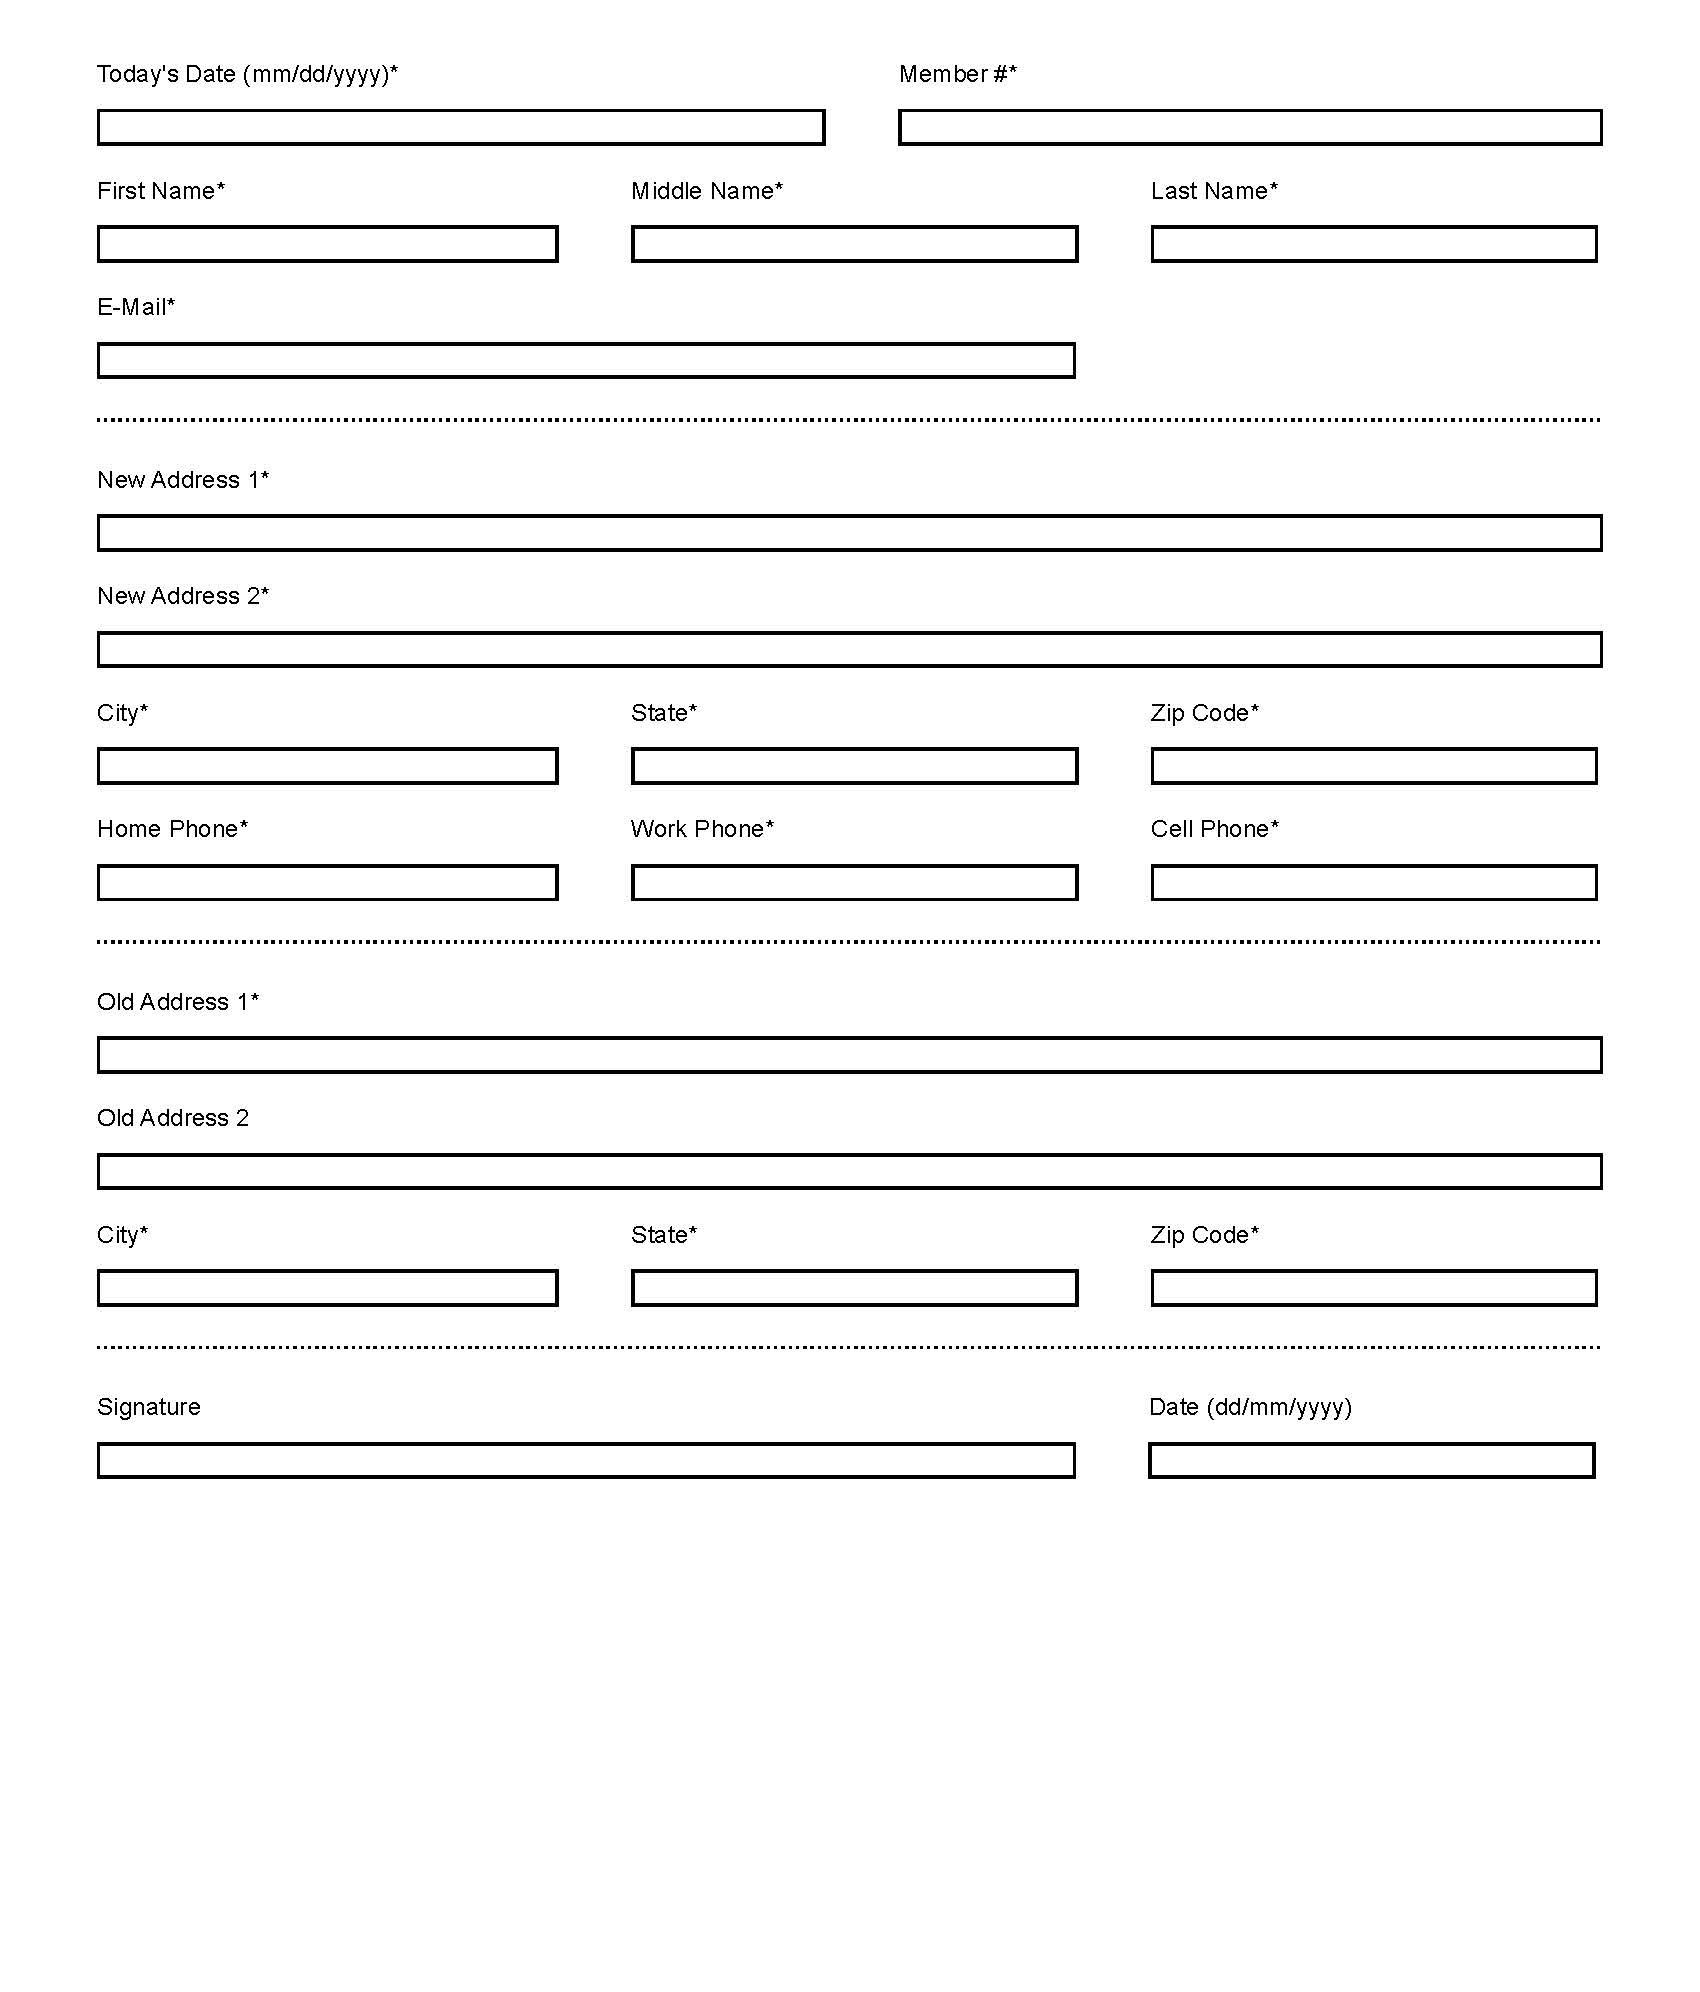 Lowland Credit Union Change of Address Form – Official Change of Address Form